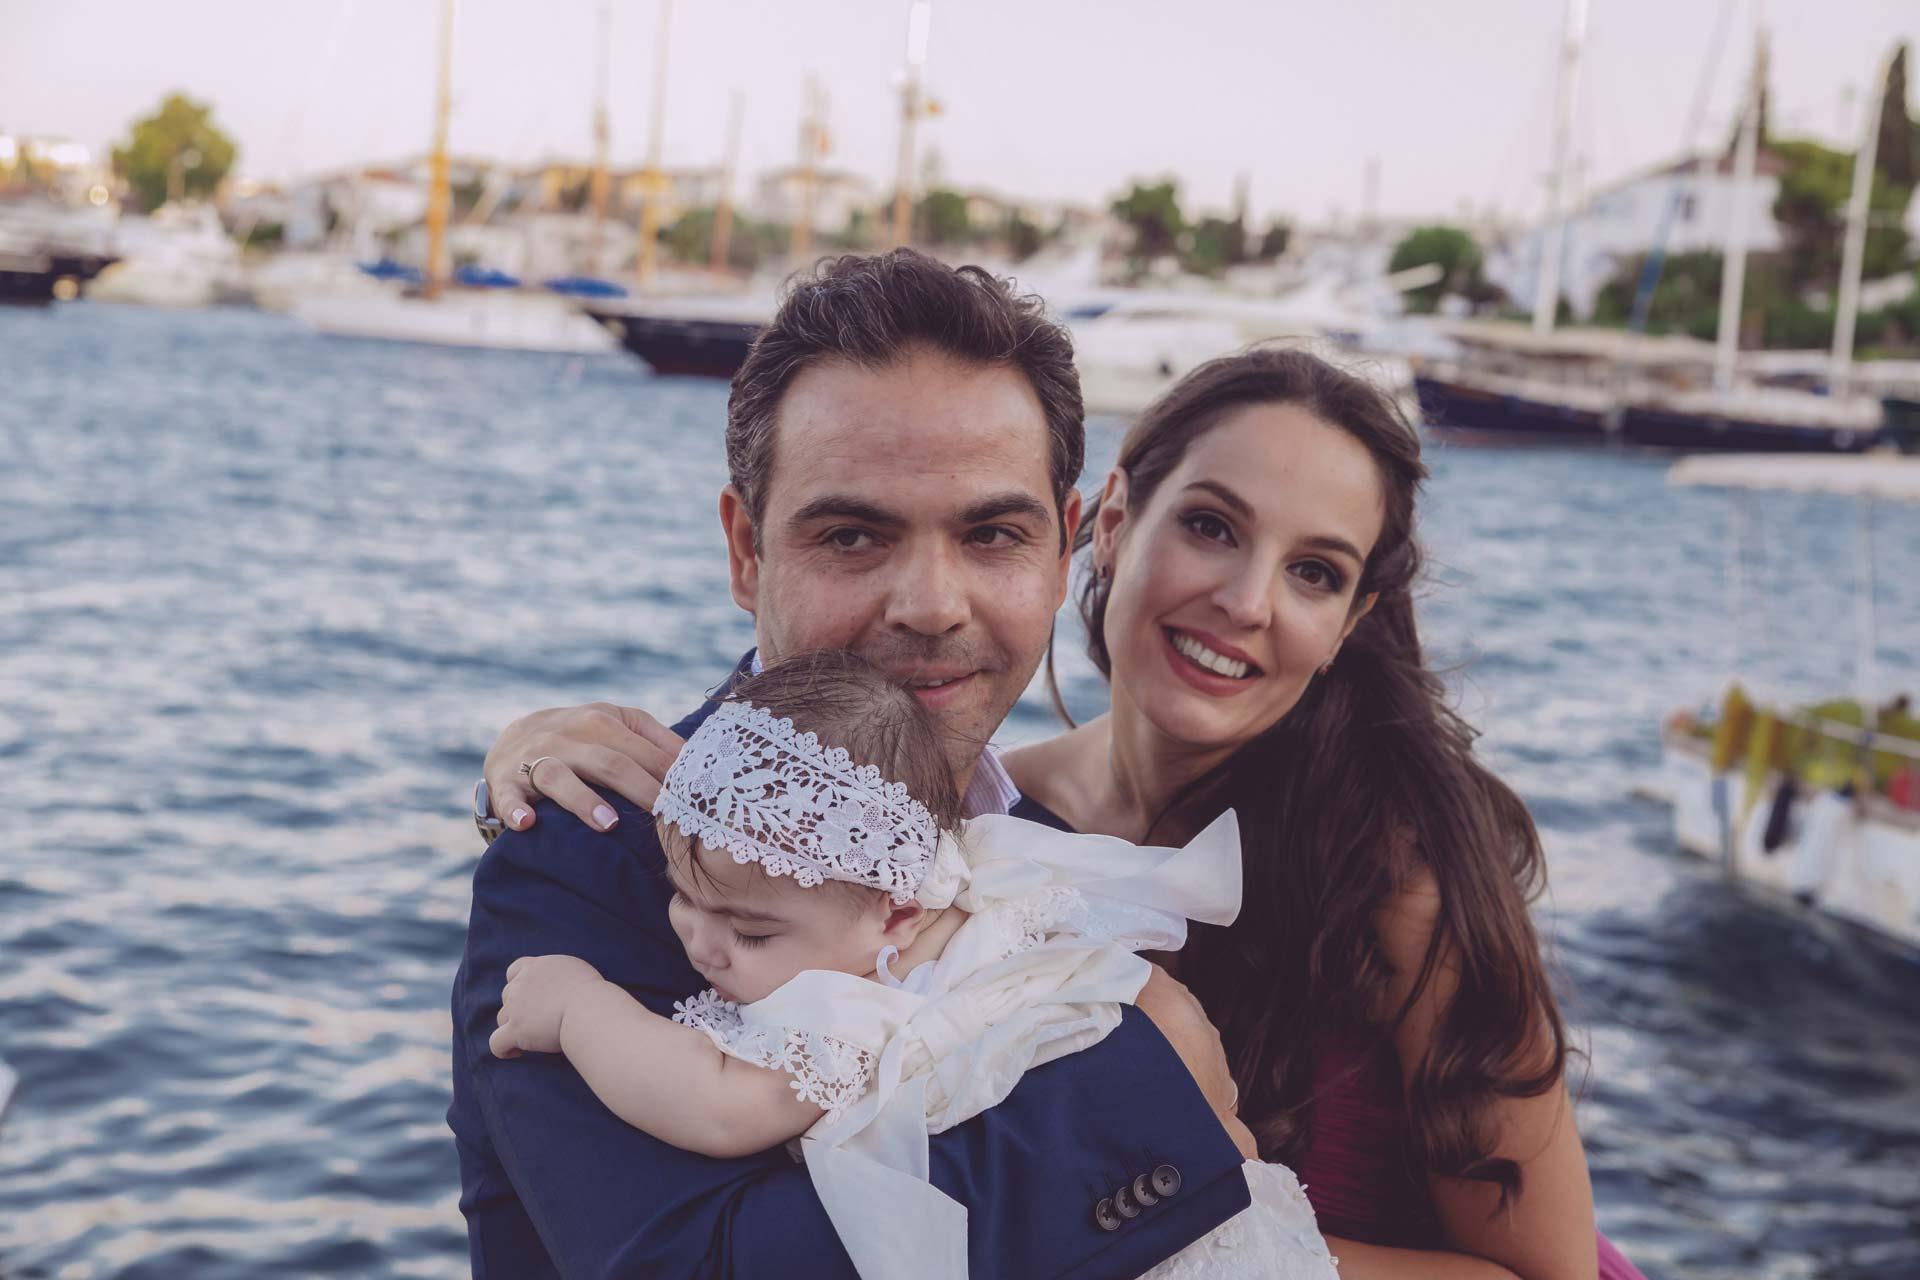 617 PhotoVaptisis βαπτιση σπετσεσ φωτογραφοσ vaptisi koritsi agios nikolaos spestes island photographer family